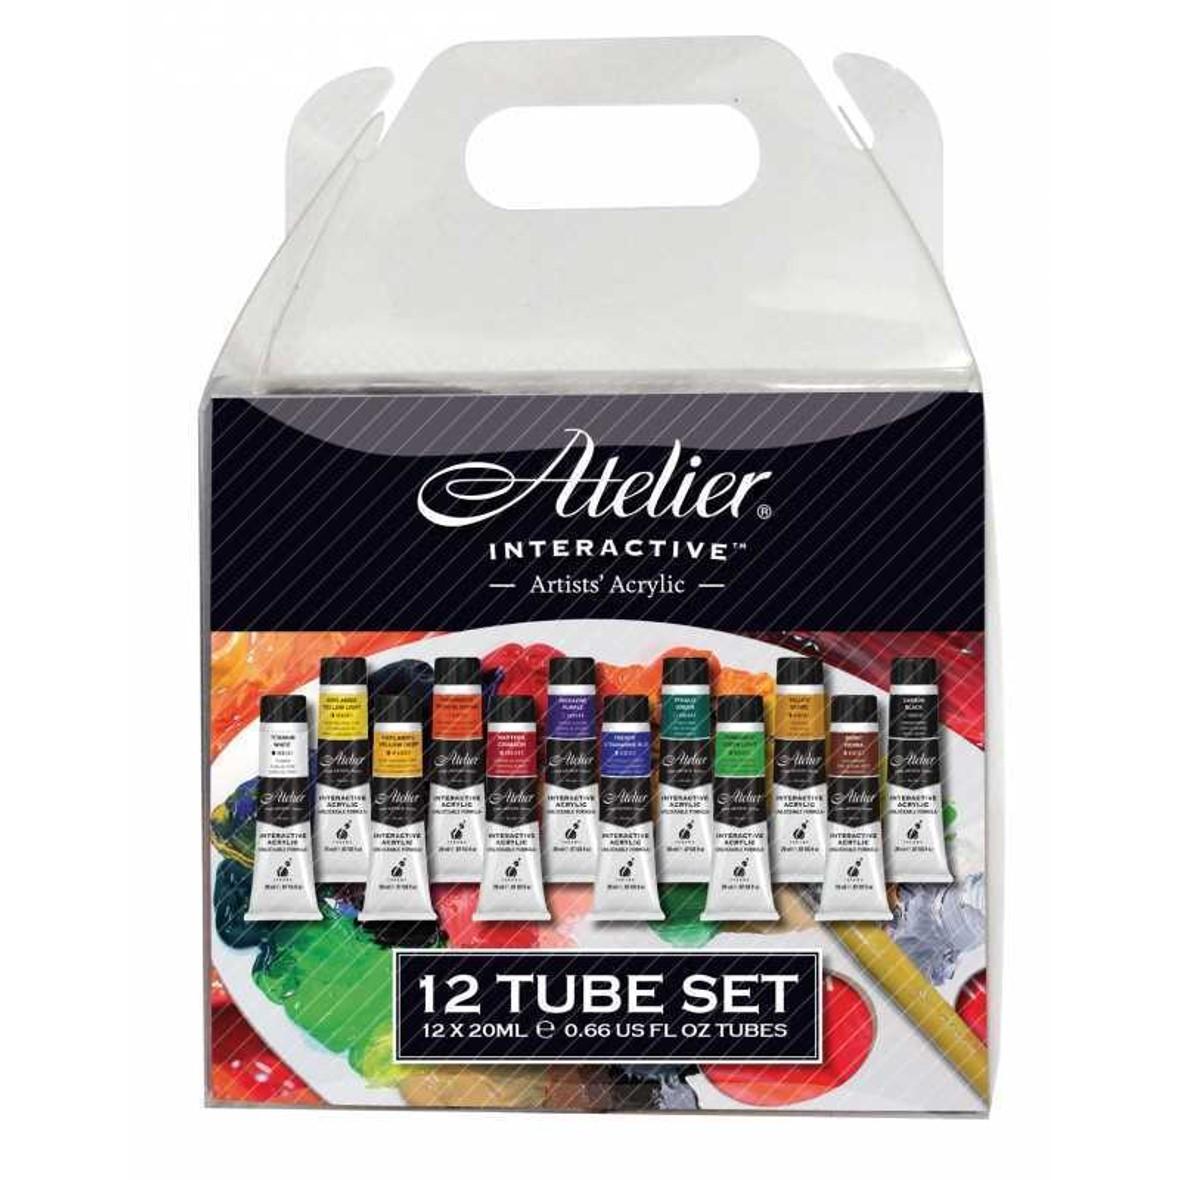 Atelier Interactive 12 Tube Set x 20ml